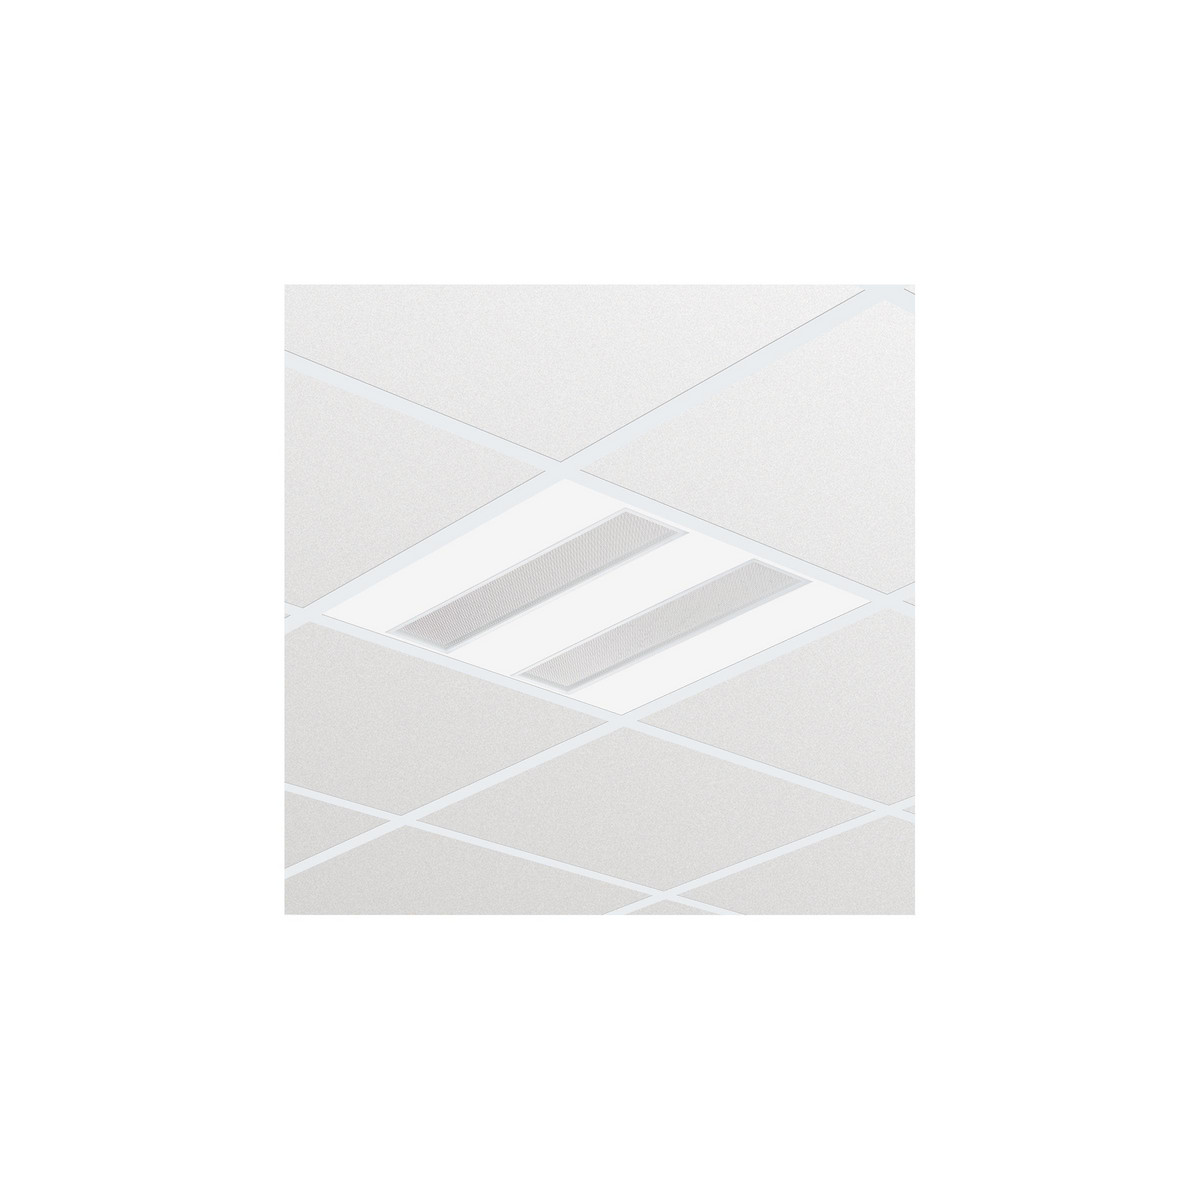 Philips FlexBlend Indbyg RC340B 3600lm/840 SpaceWise 60x60 Synlig T-skinne MLO-optik OC/UGR<19